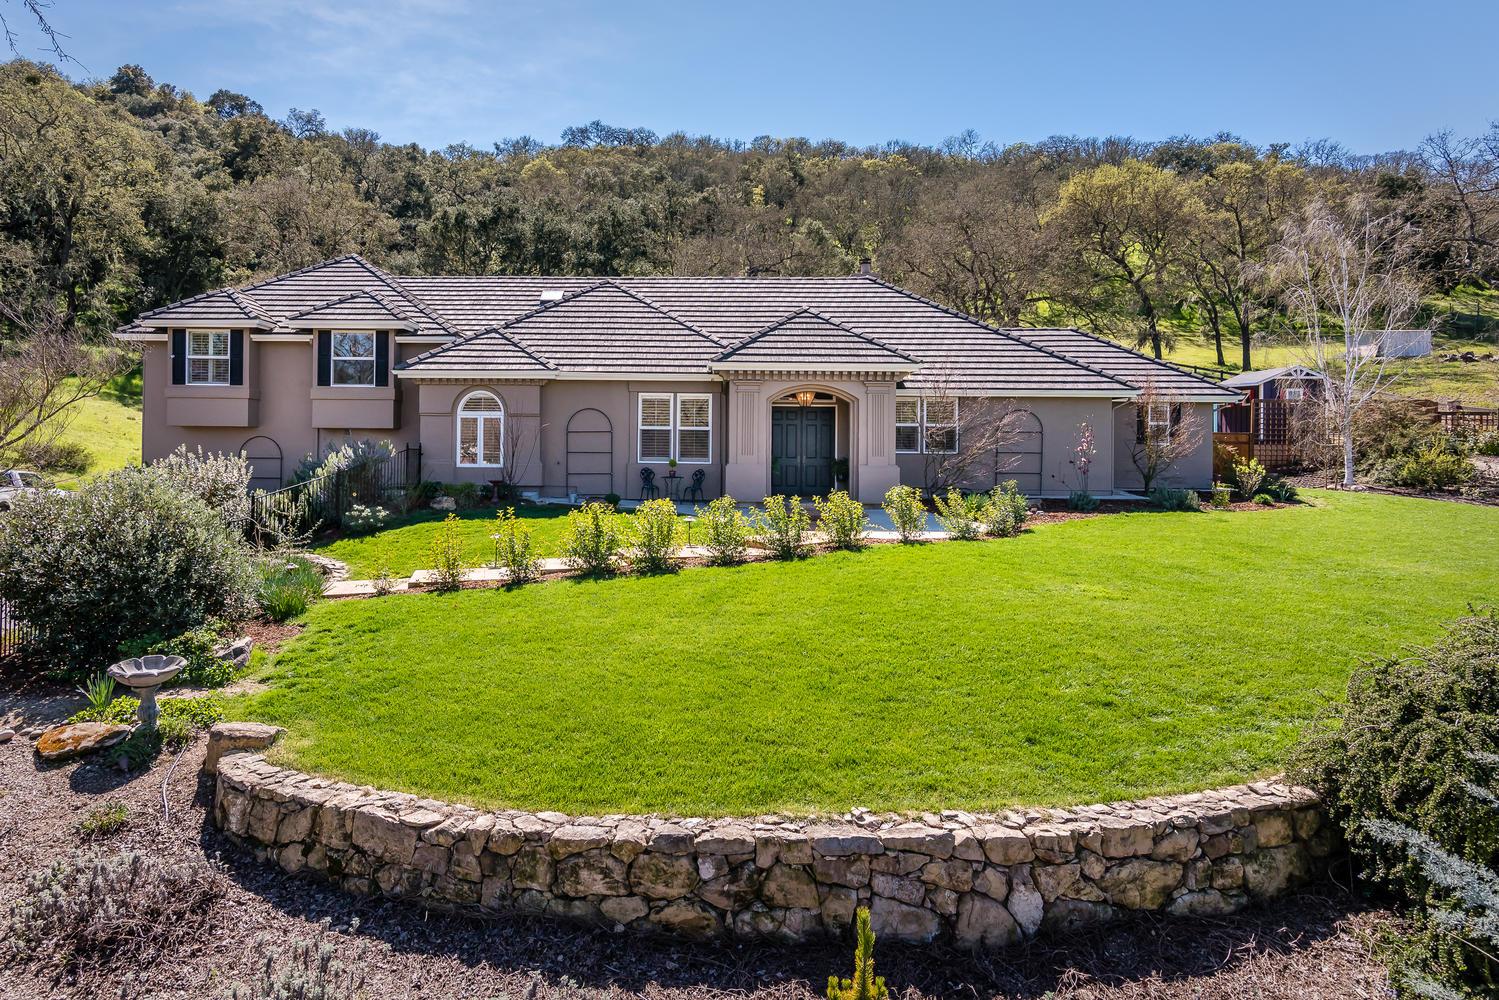 Nhà ở một gia đình vì Bán tại Welcome Home! 6400 San Gabriel Road Atascadero, California, 93422 Hoa Kỳ